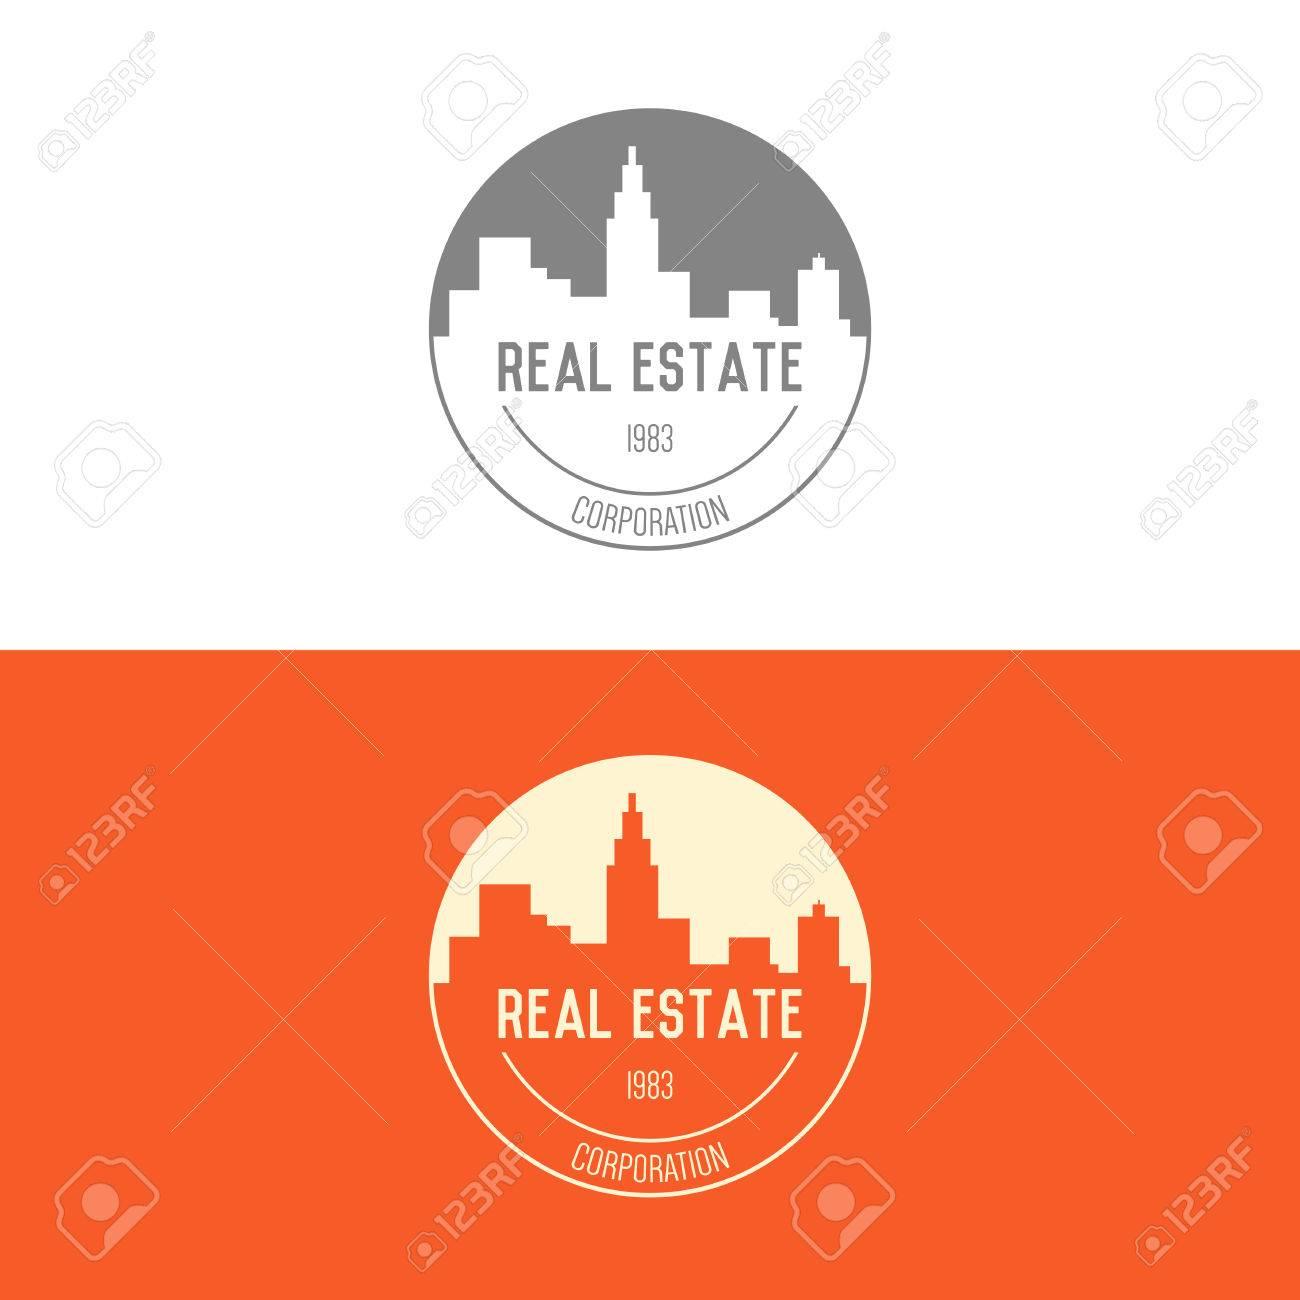 Logo inspiration for construction companies, real estate agencies